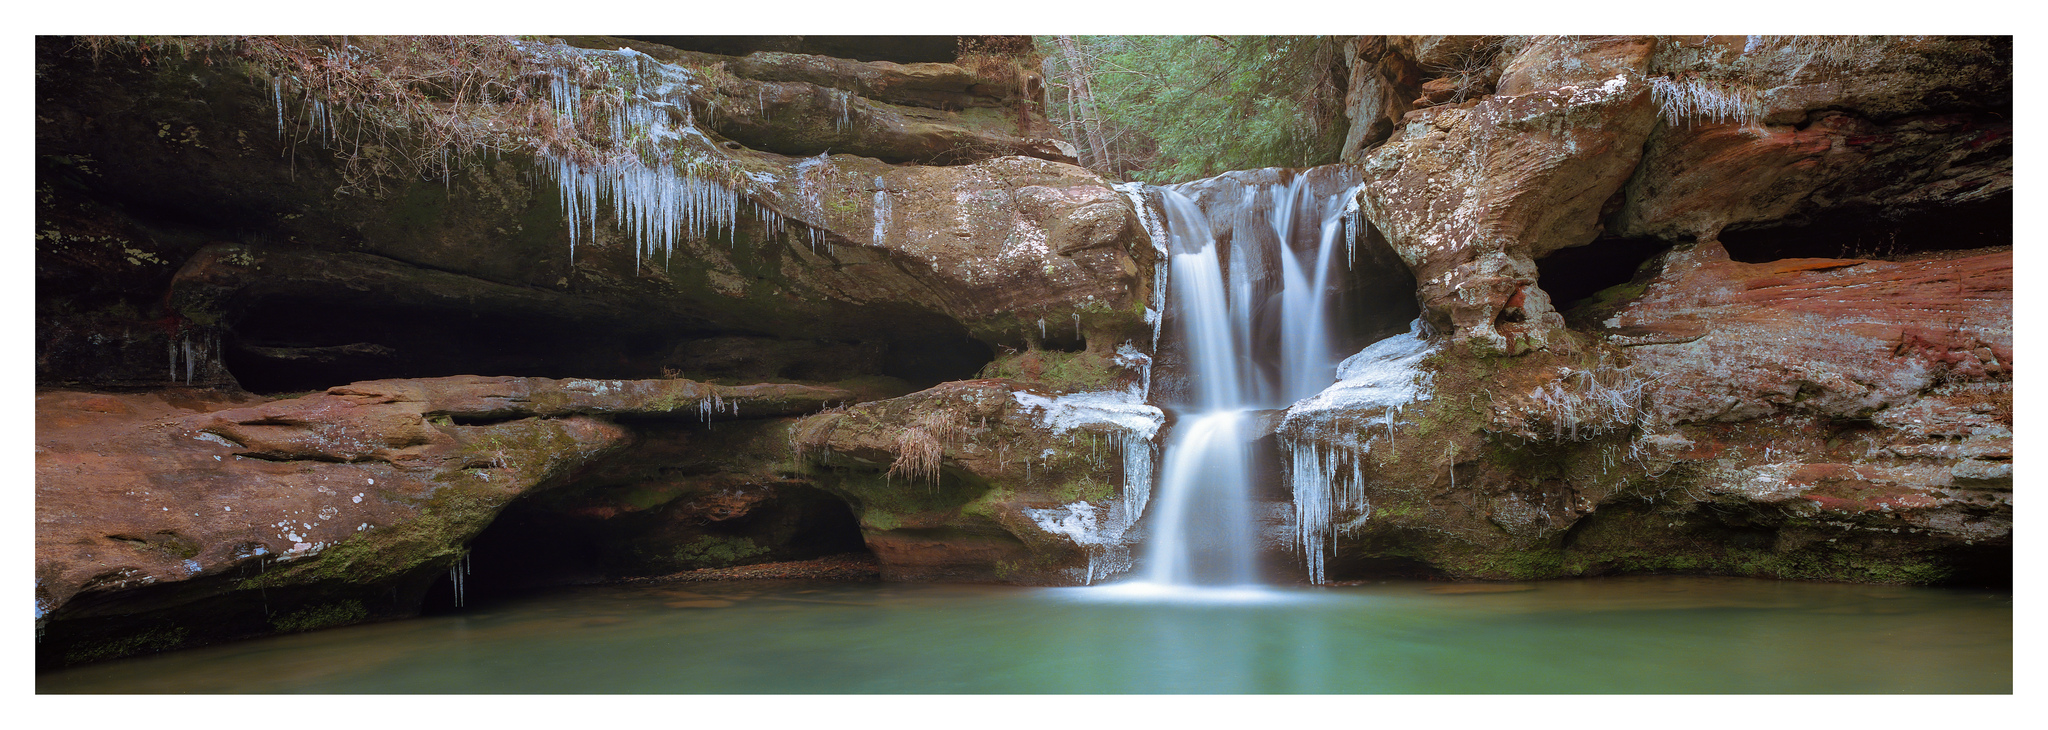 Upper Falls - Fuji GX617 w/105mm lens on Ektar 100 film